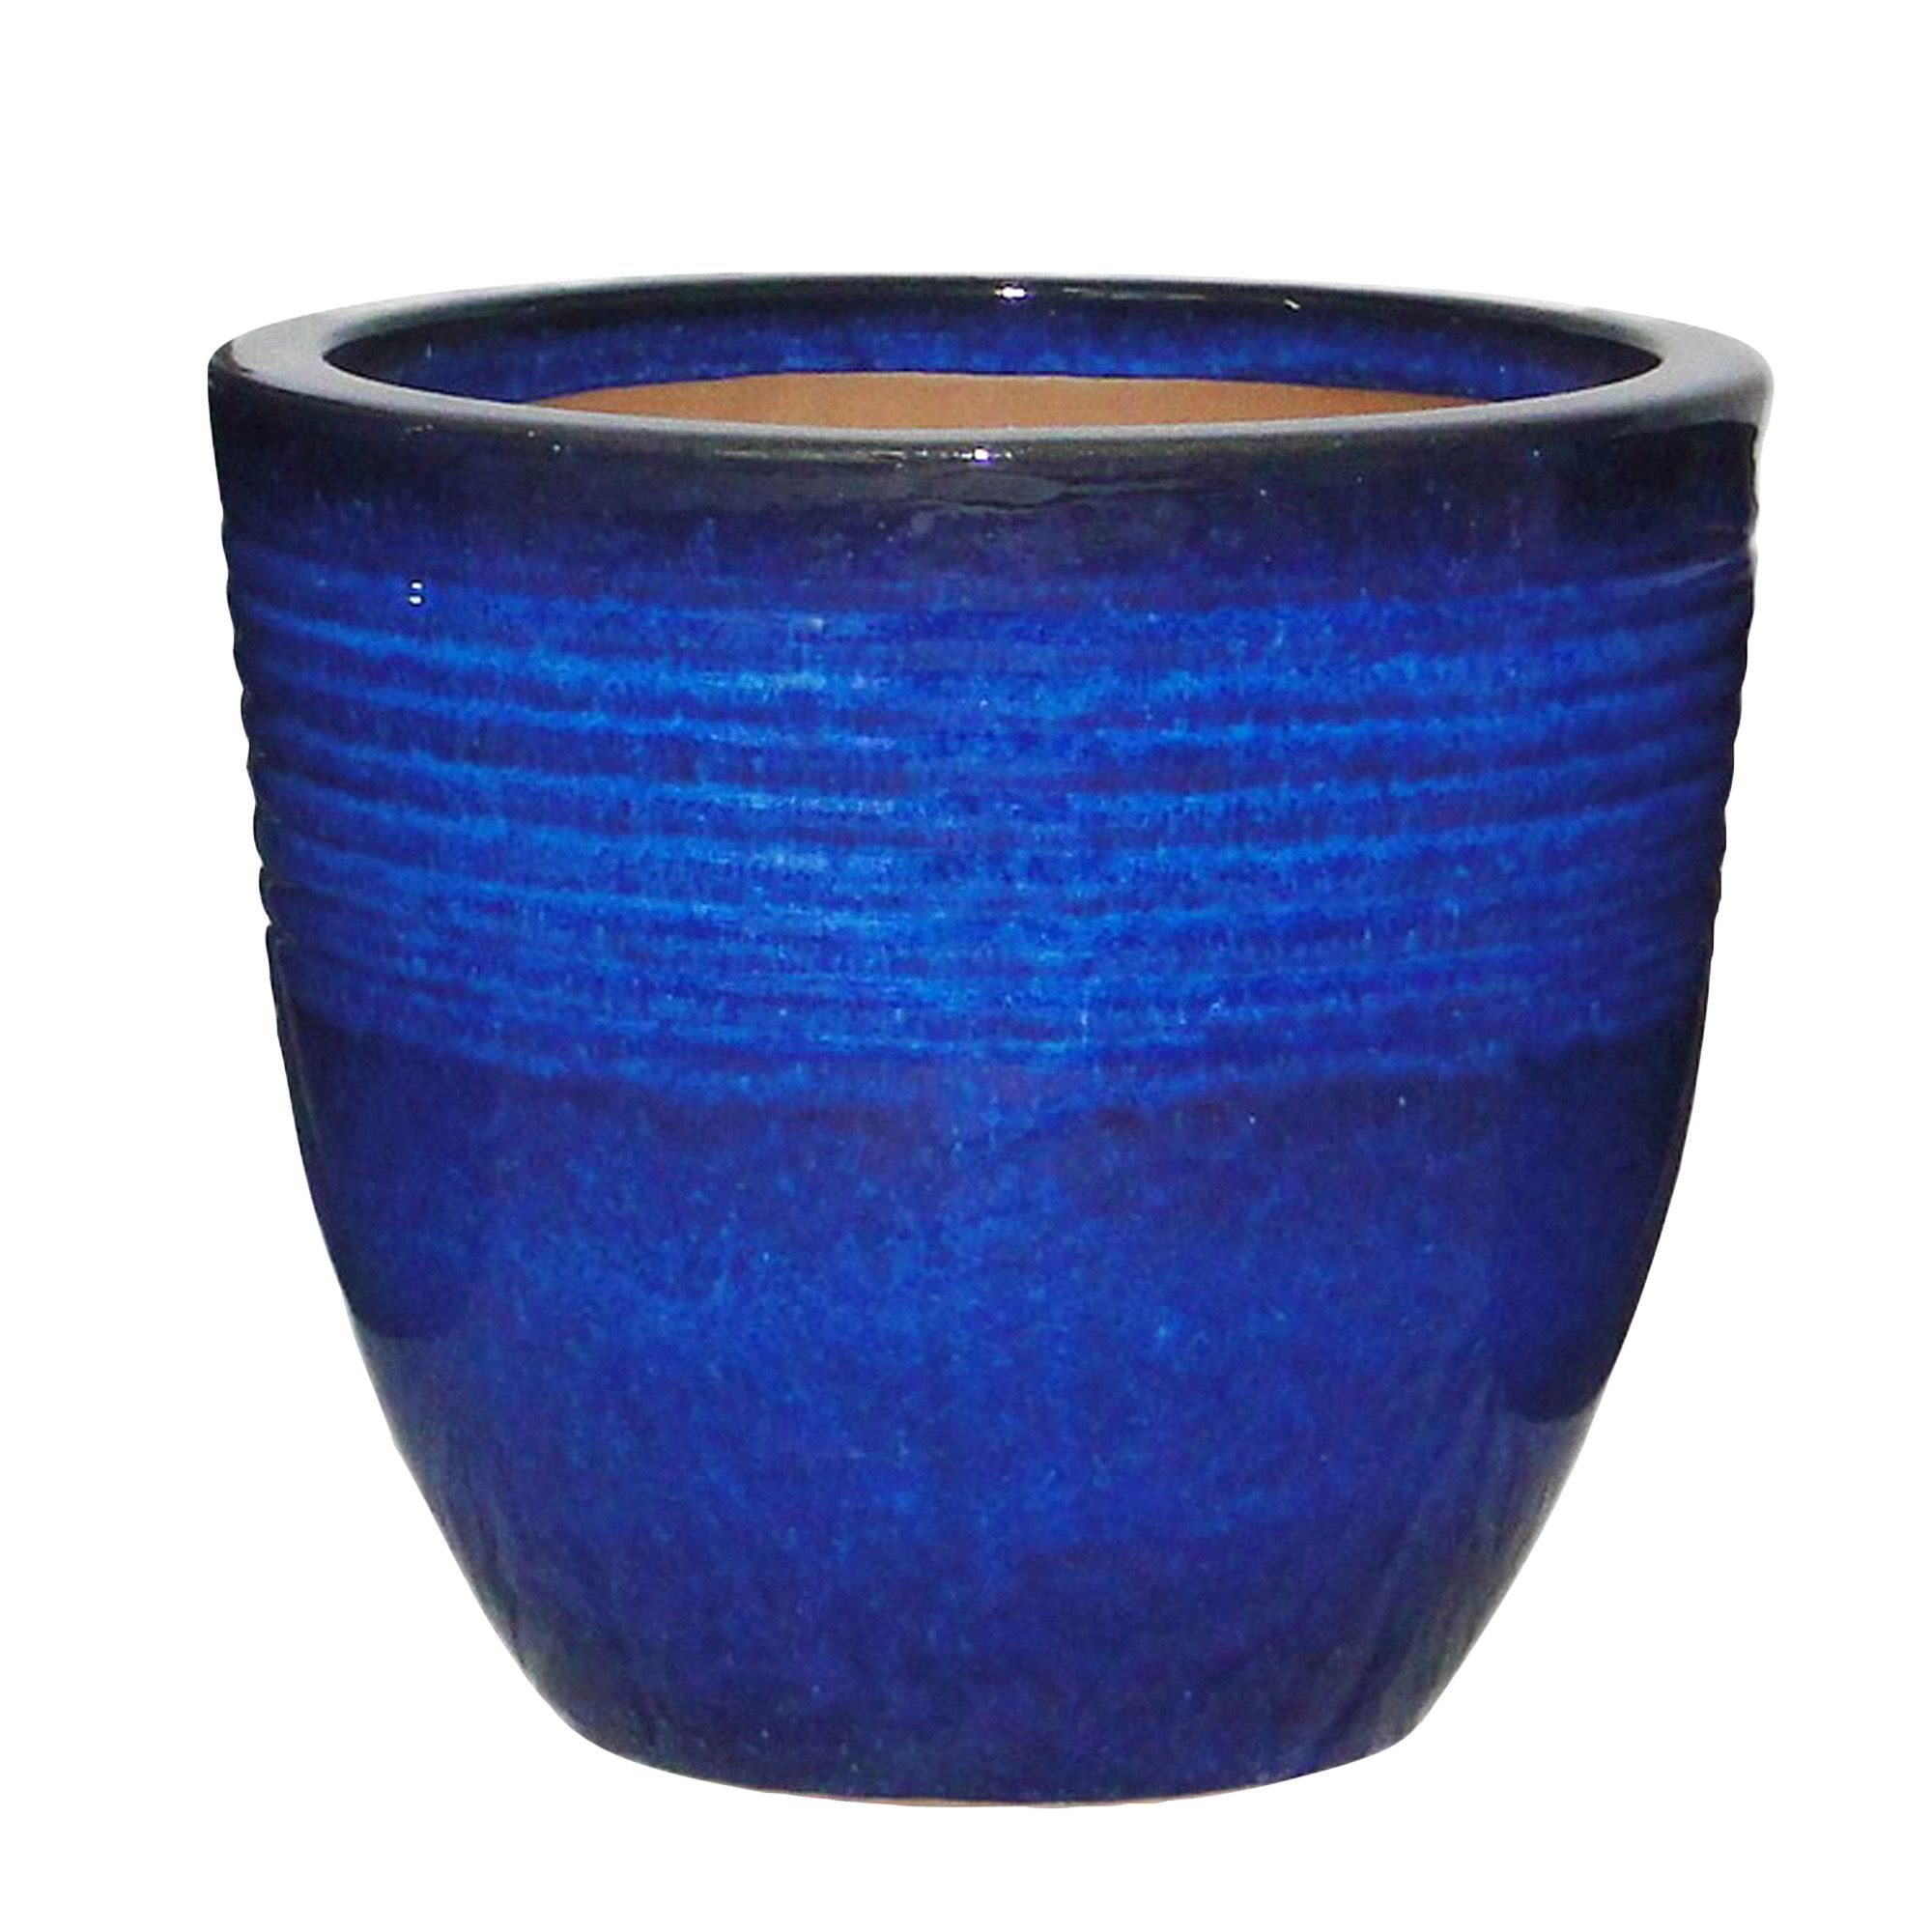 Blue Bathroom Paint Ideas Seacourt Round Glazed Blue Pot H 245mm Dia 270mm